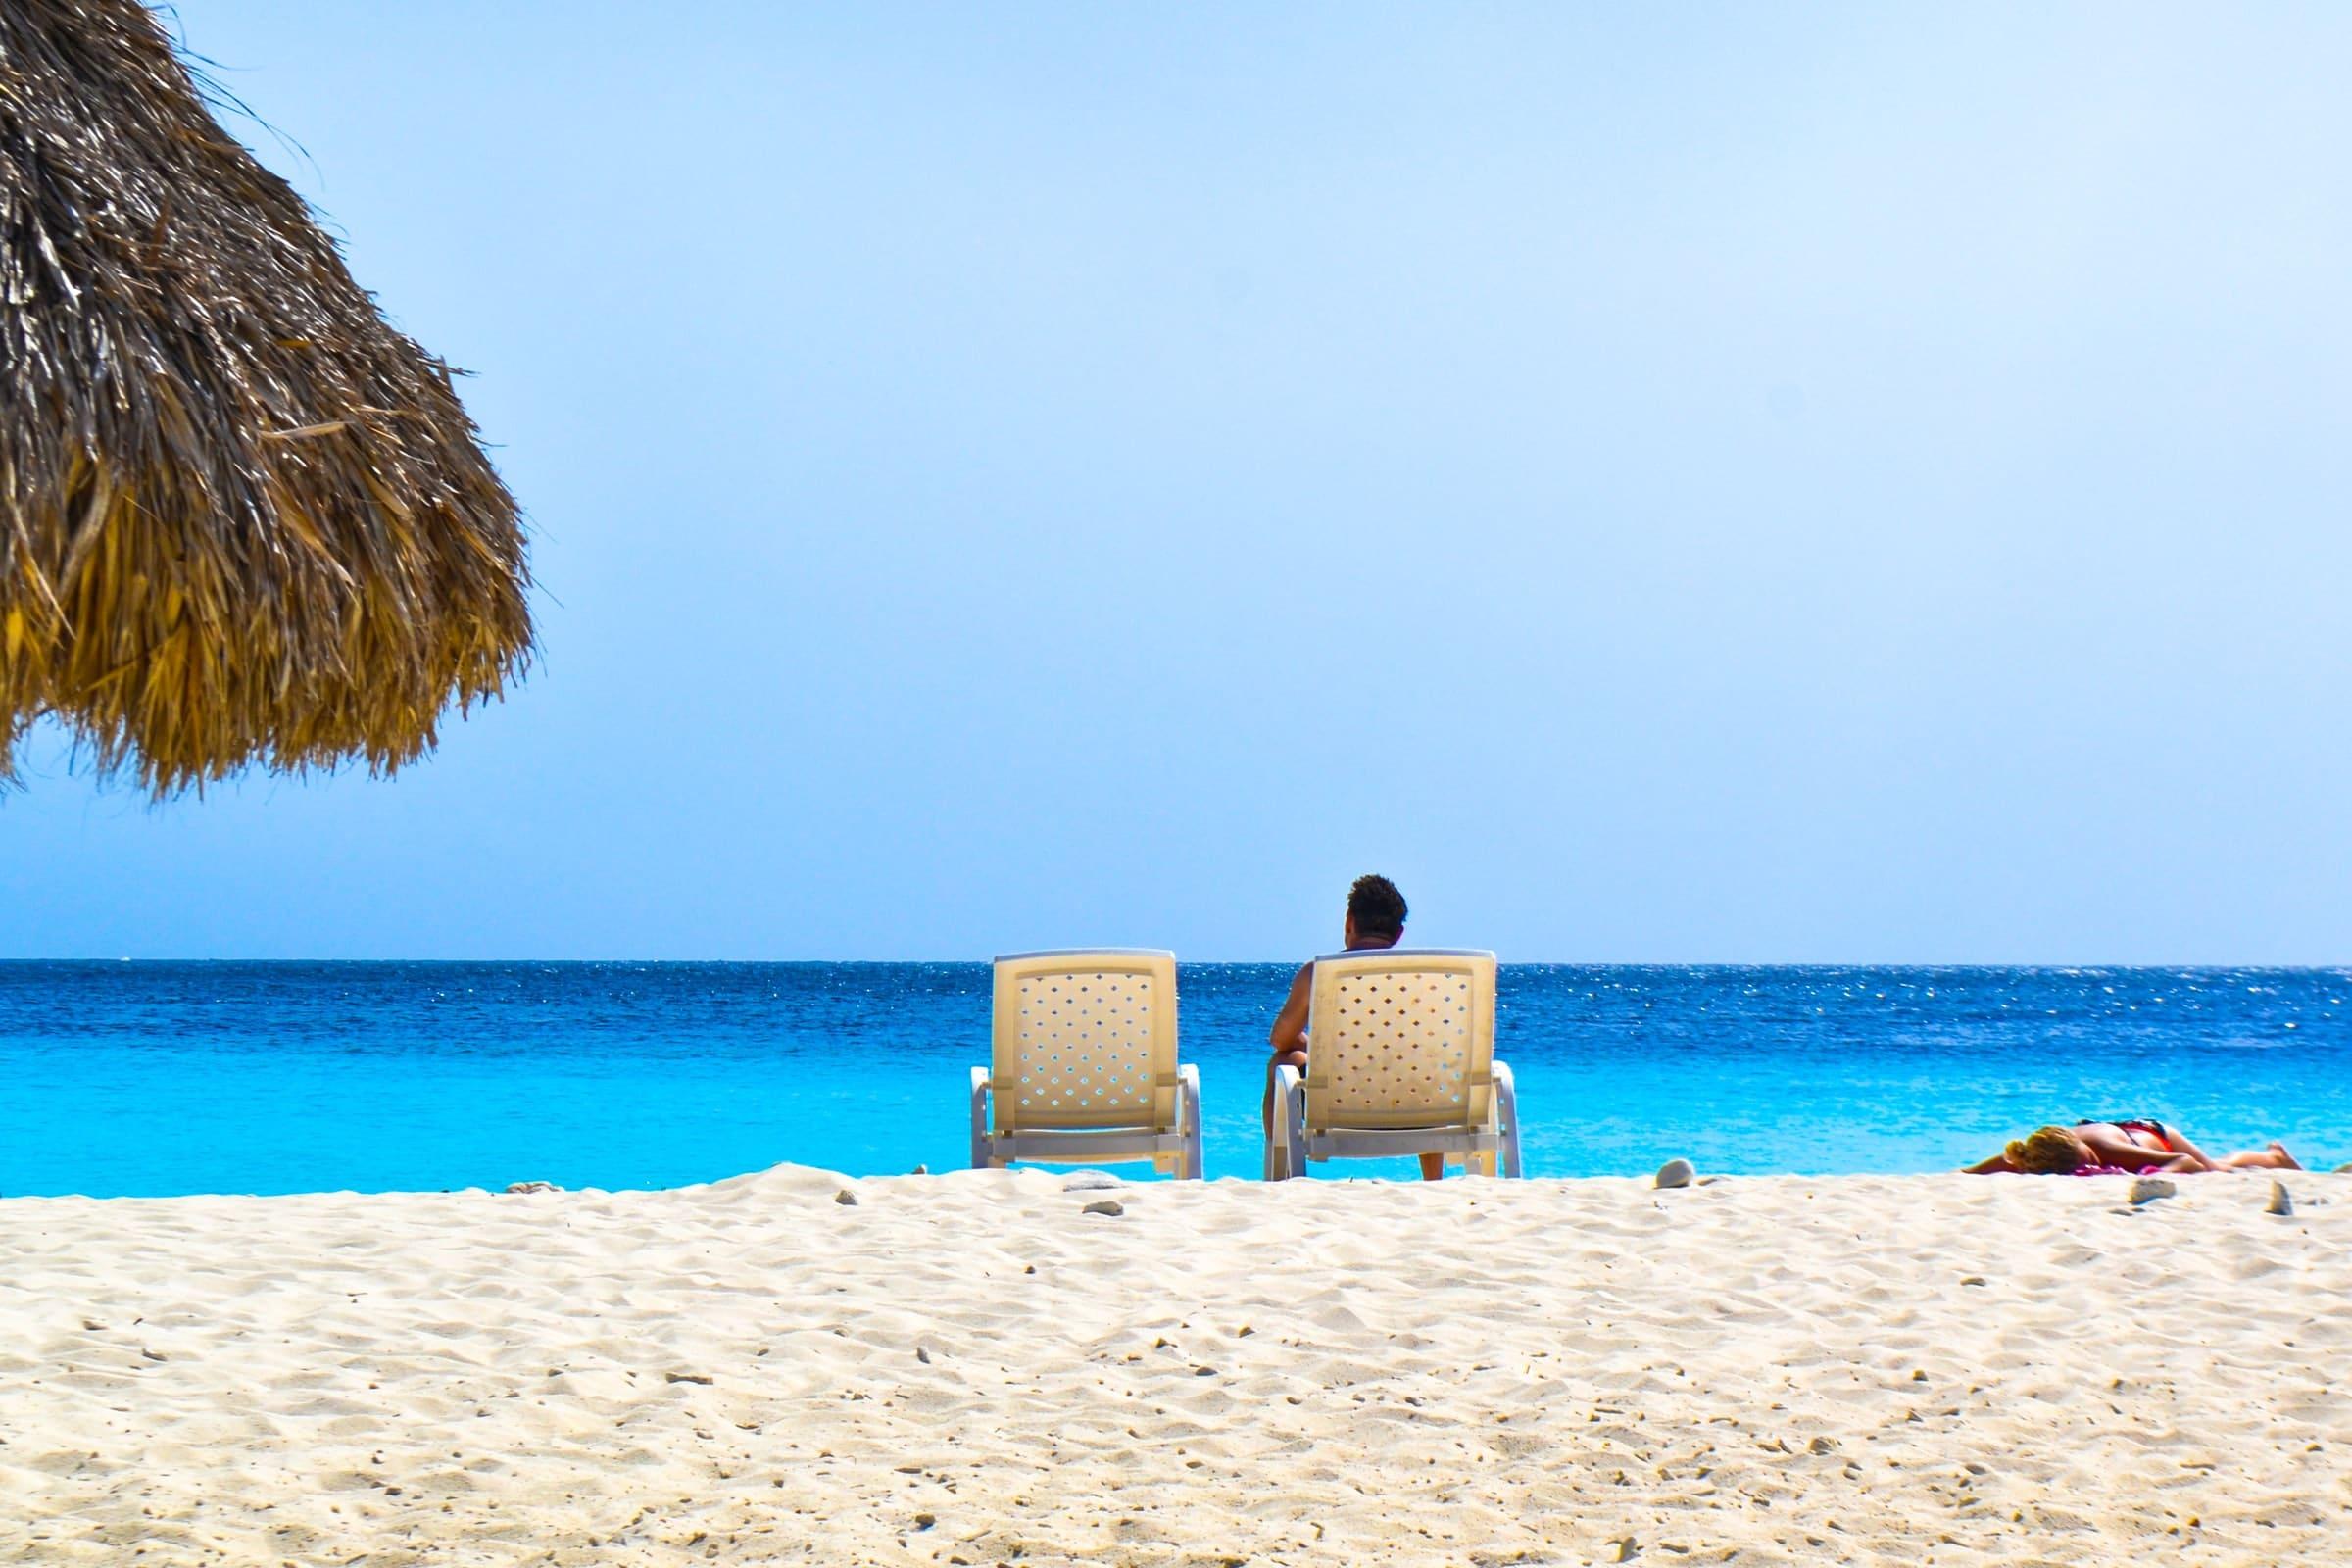 Witte stranden en blauwe zee in Curaçao